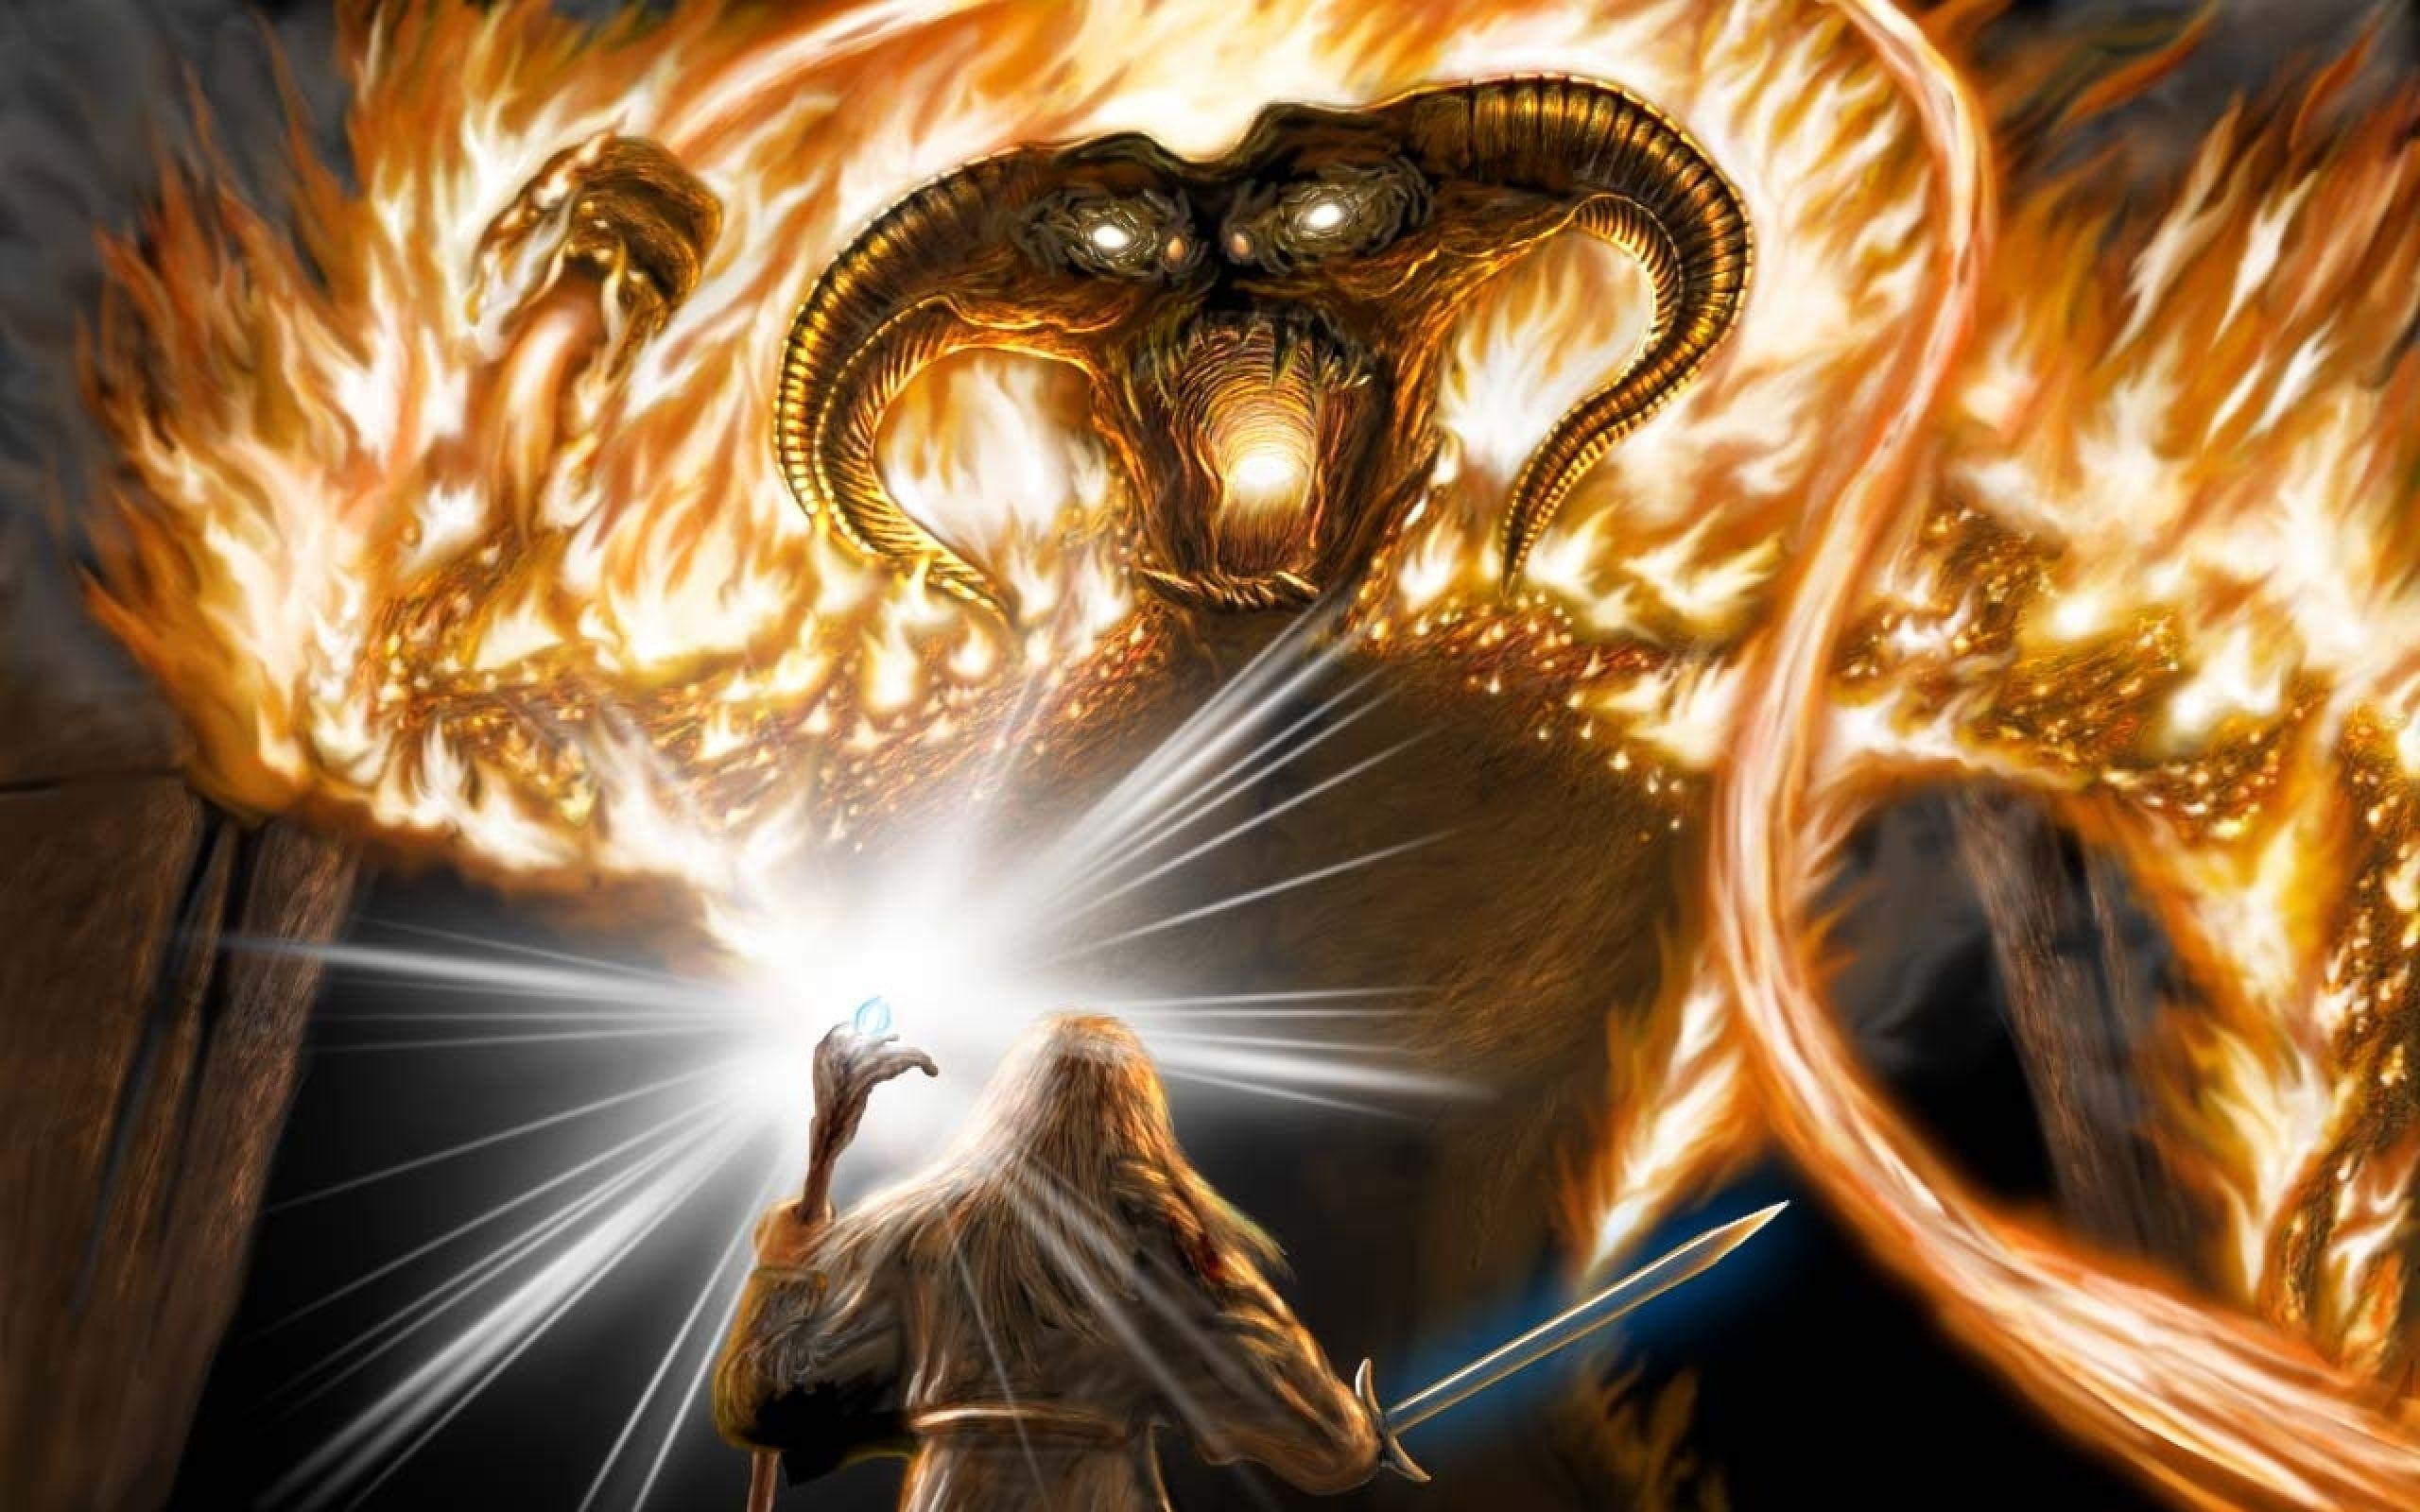 Sword Art Staff Battle Balrog Balrog The Lord Of The Rings Moria Gandalf Gandalf 2k Wallpaper Hdwallpaper Desktop Lord Of The Rings Balrog Gandalf